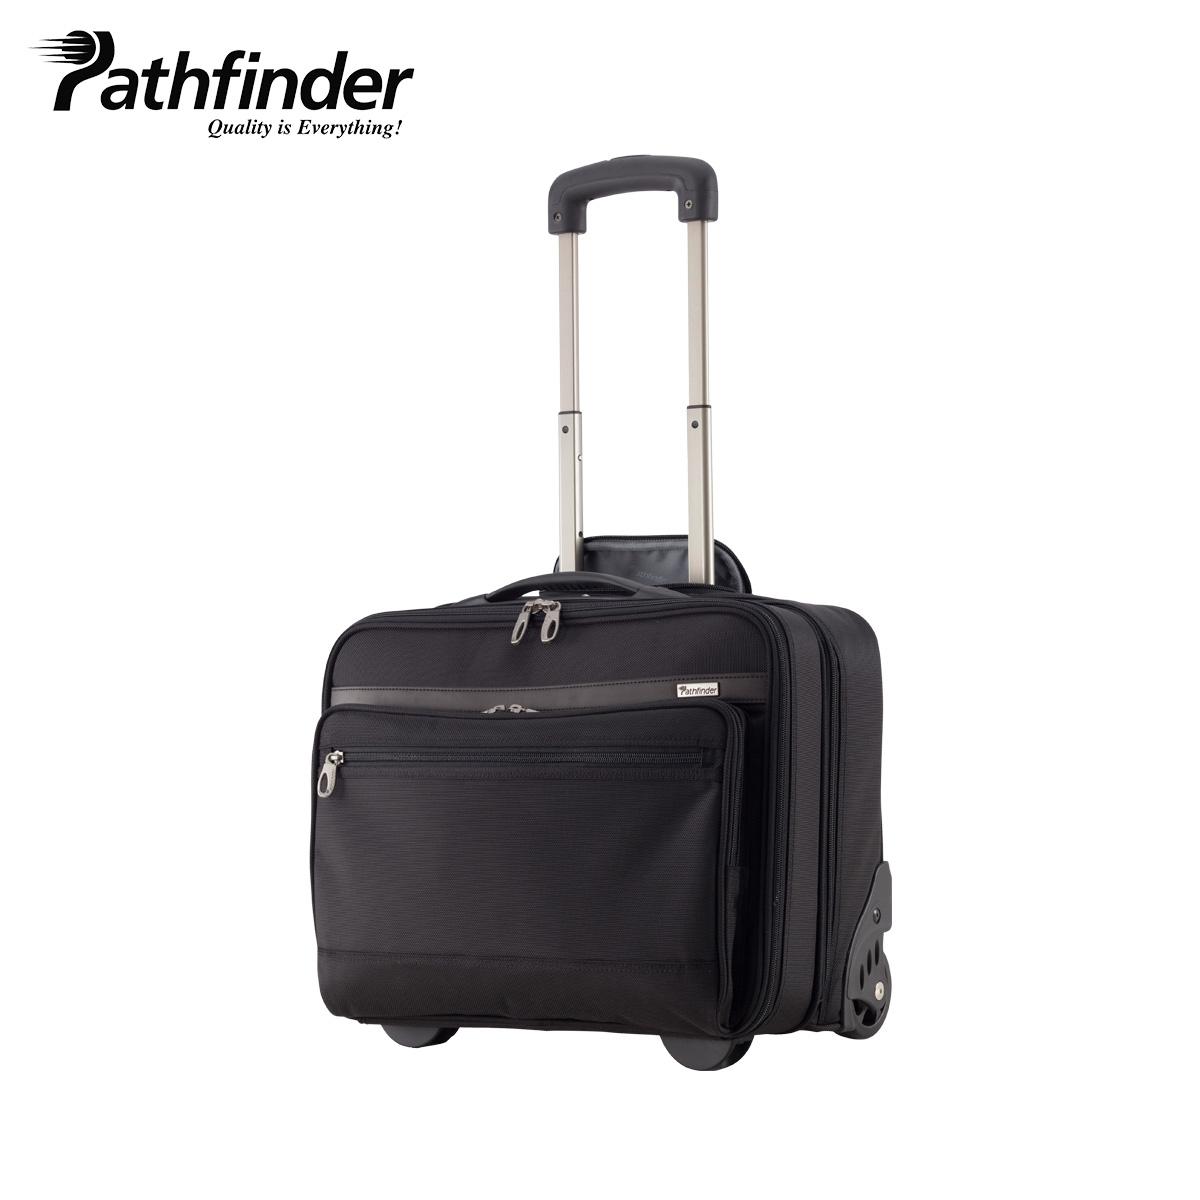 Pathfinder AVENGER パスファインダー バッグ キャリーケース キャリーバッグ スーツケース 20L メンズ 機内持ち込み ソフト ブラック 黒 PF1827B